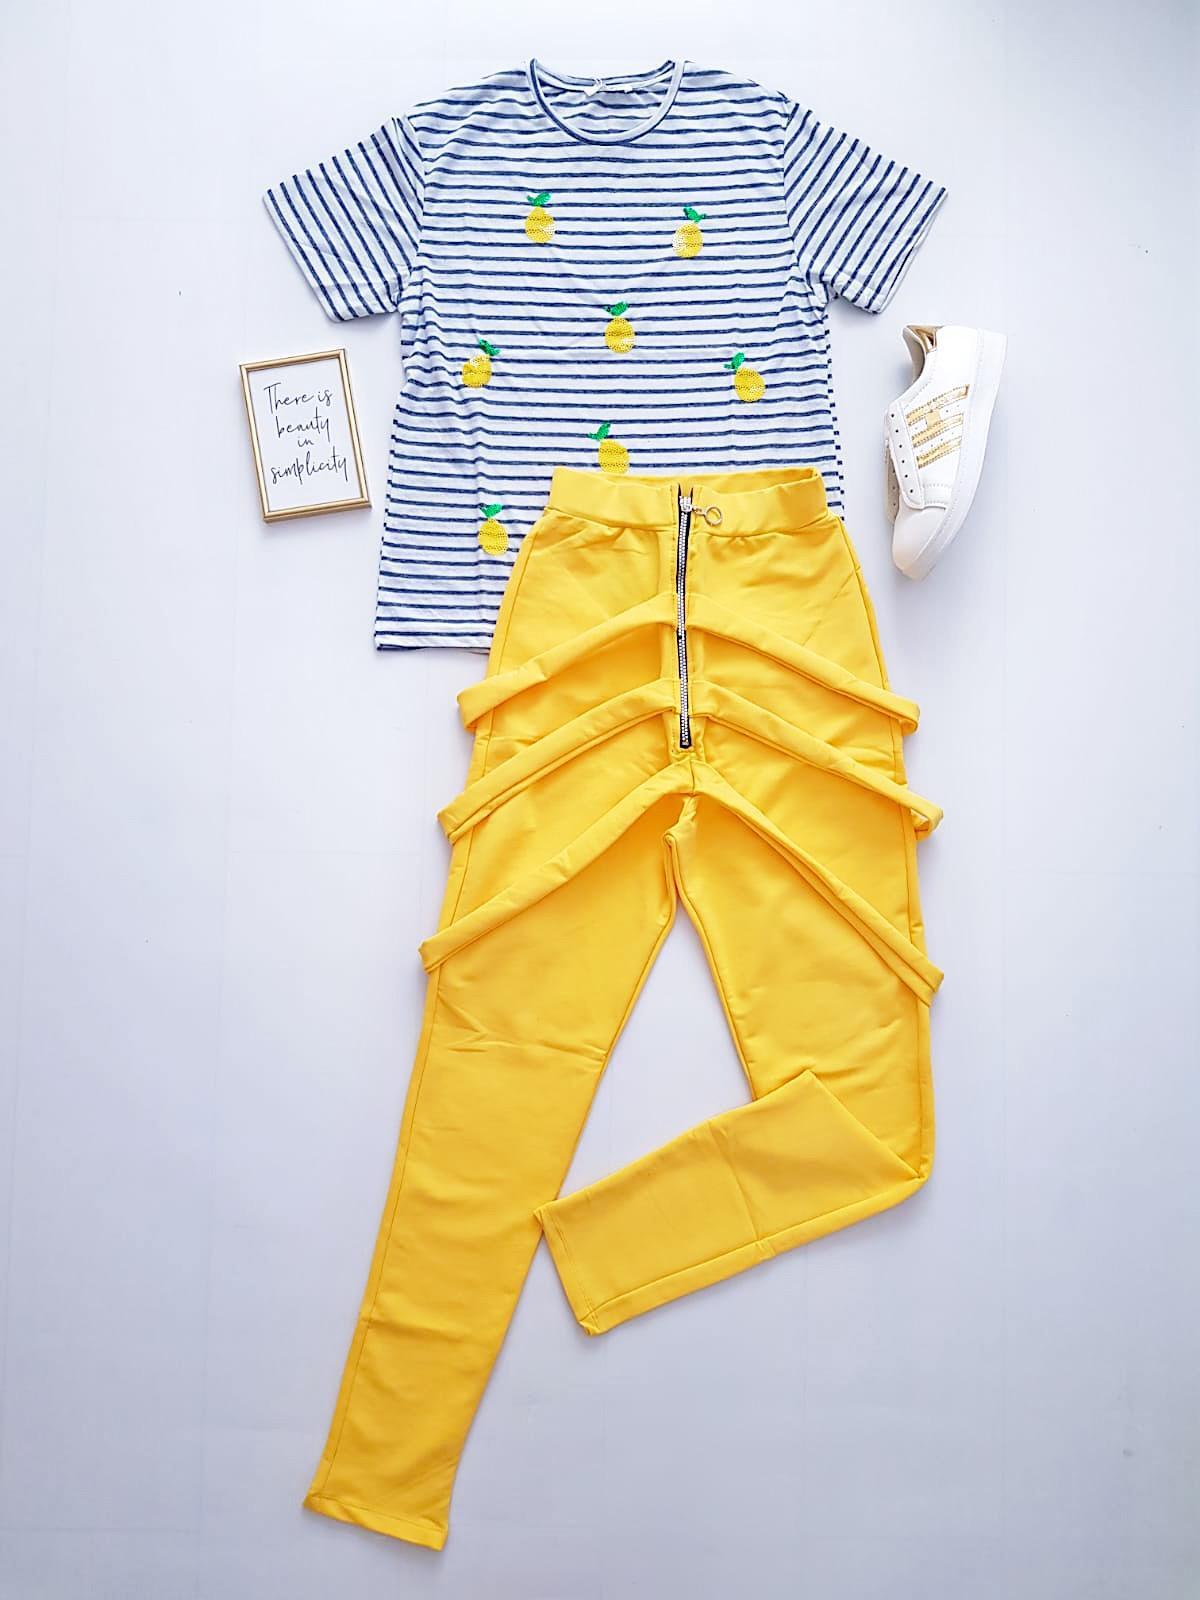 Compleu dama casual COMBO din pantaloni lungi vaga galben + tricou dungi Lemon